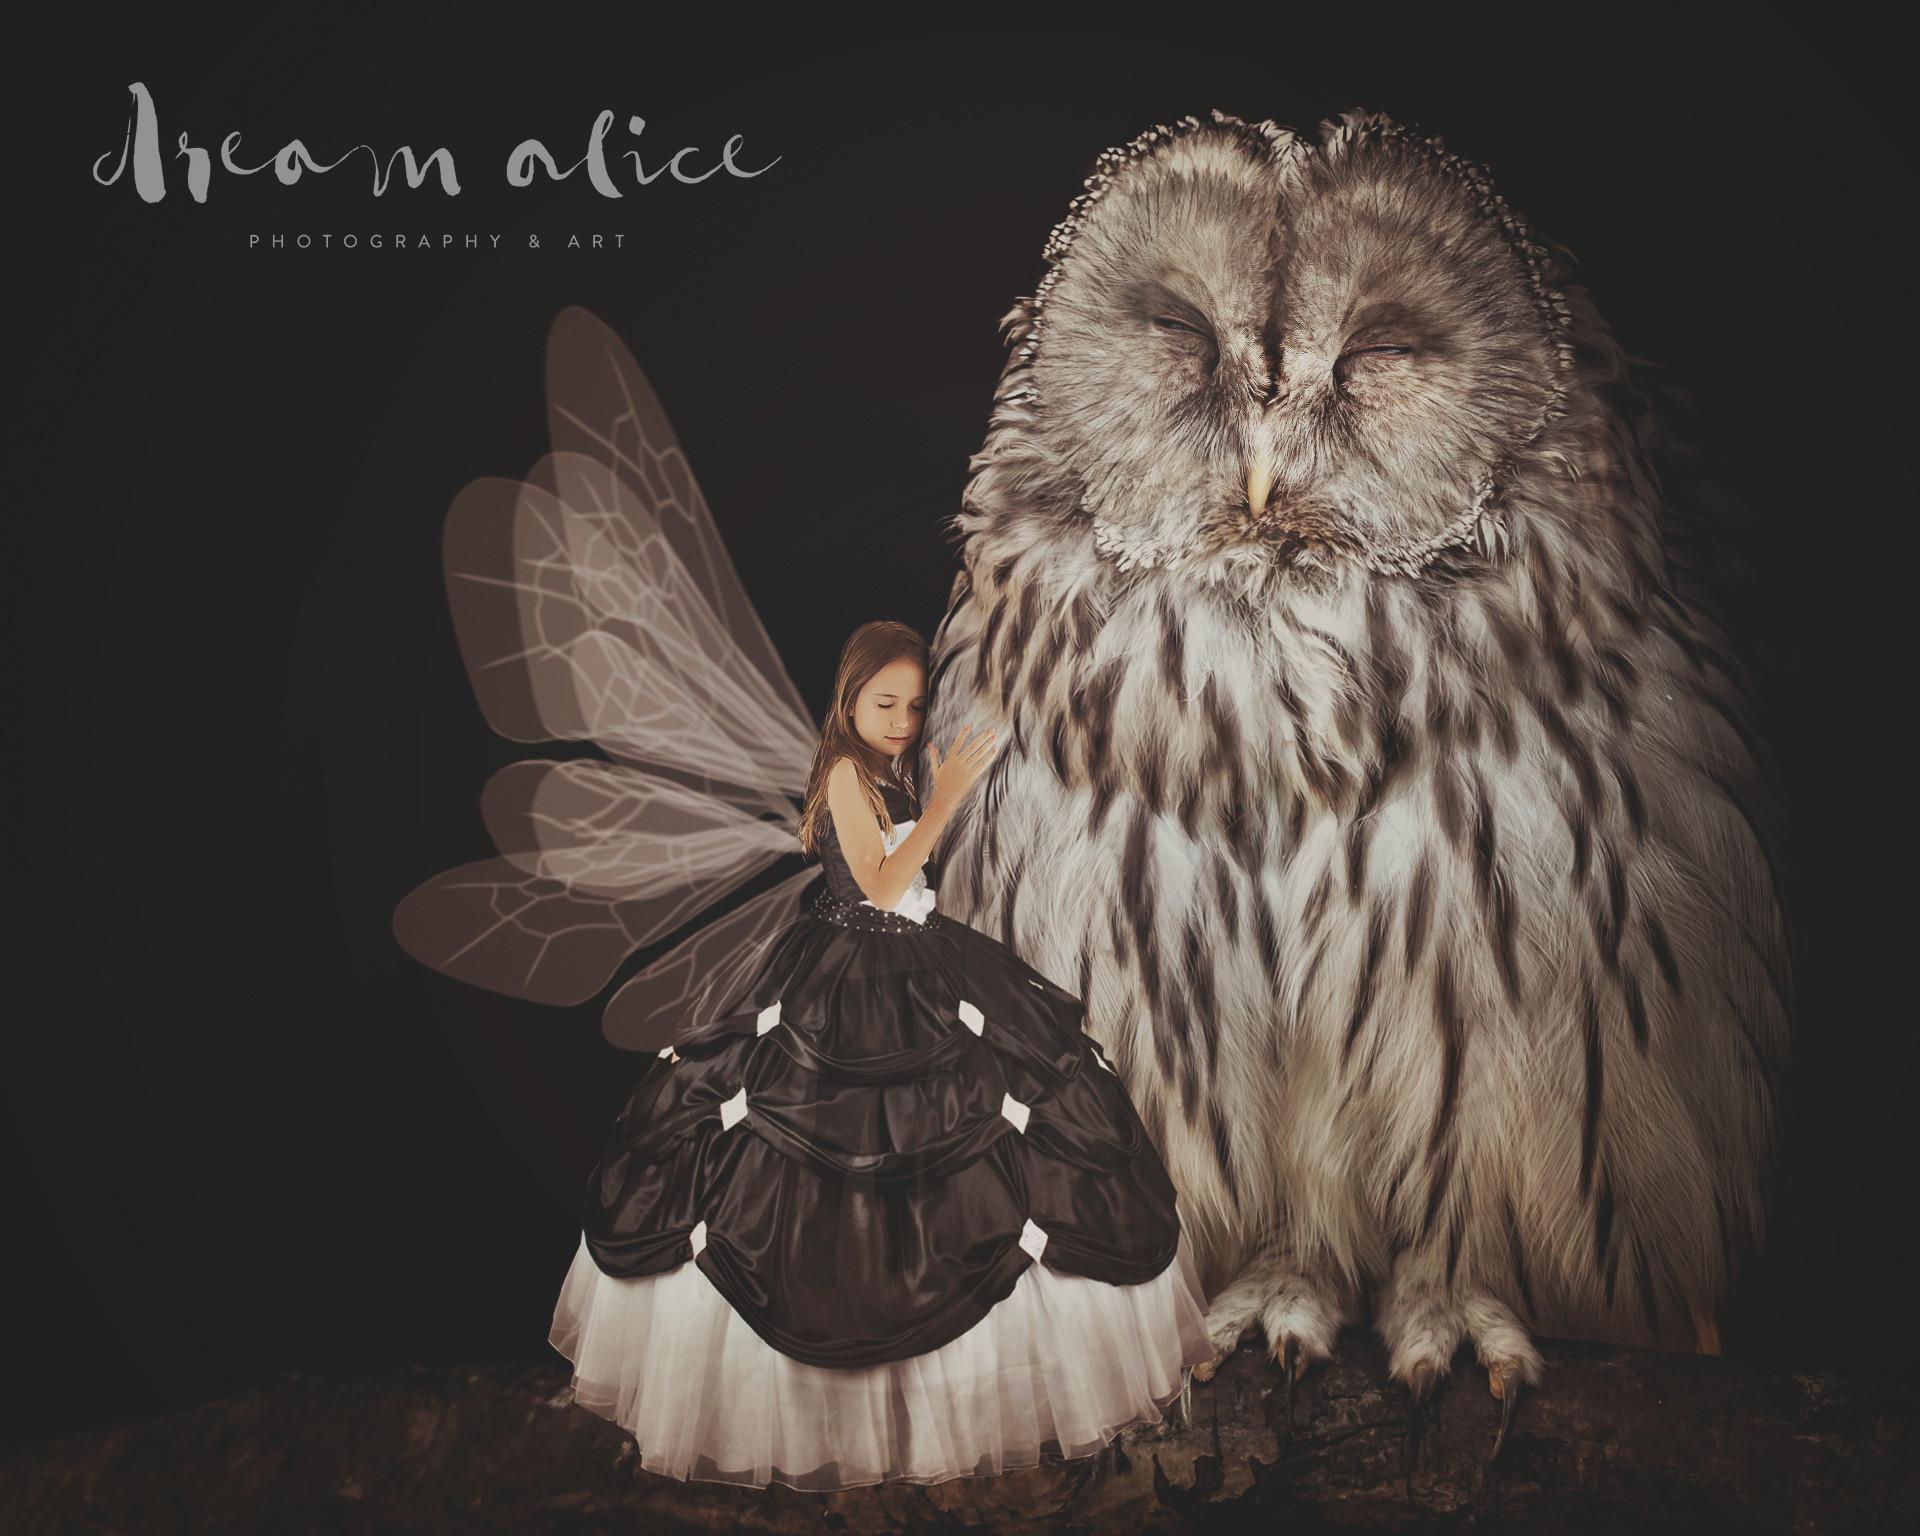 Owl Love. Creative Children's Photography fantasy photoshoot, Dream Alice Photography & Art, Gold Coast